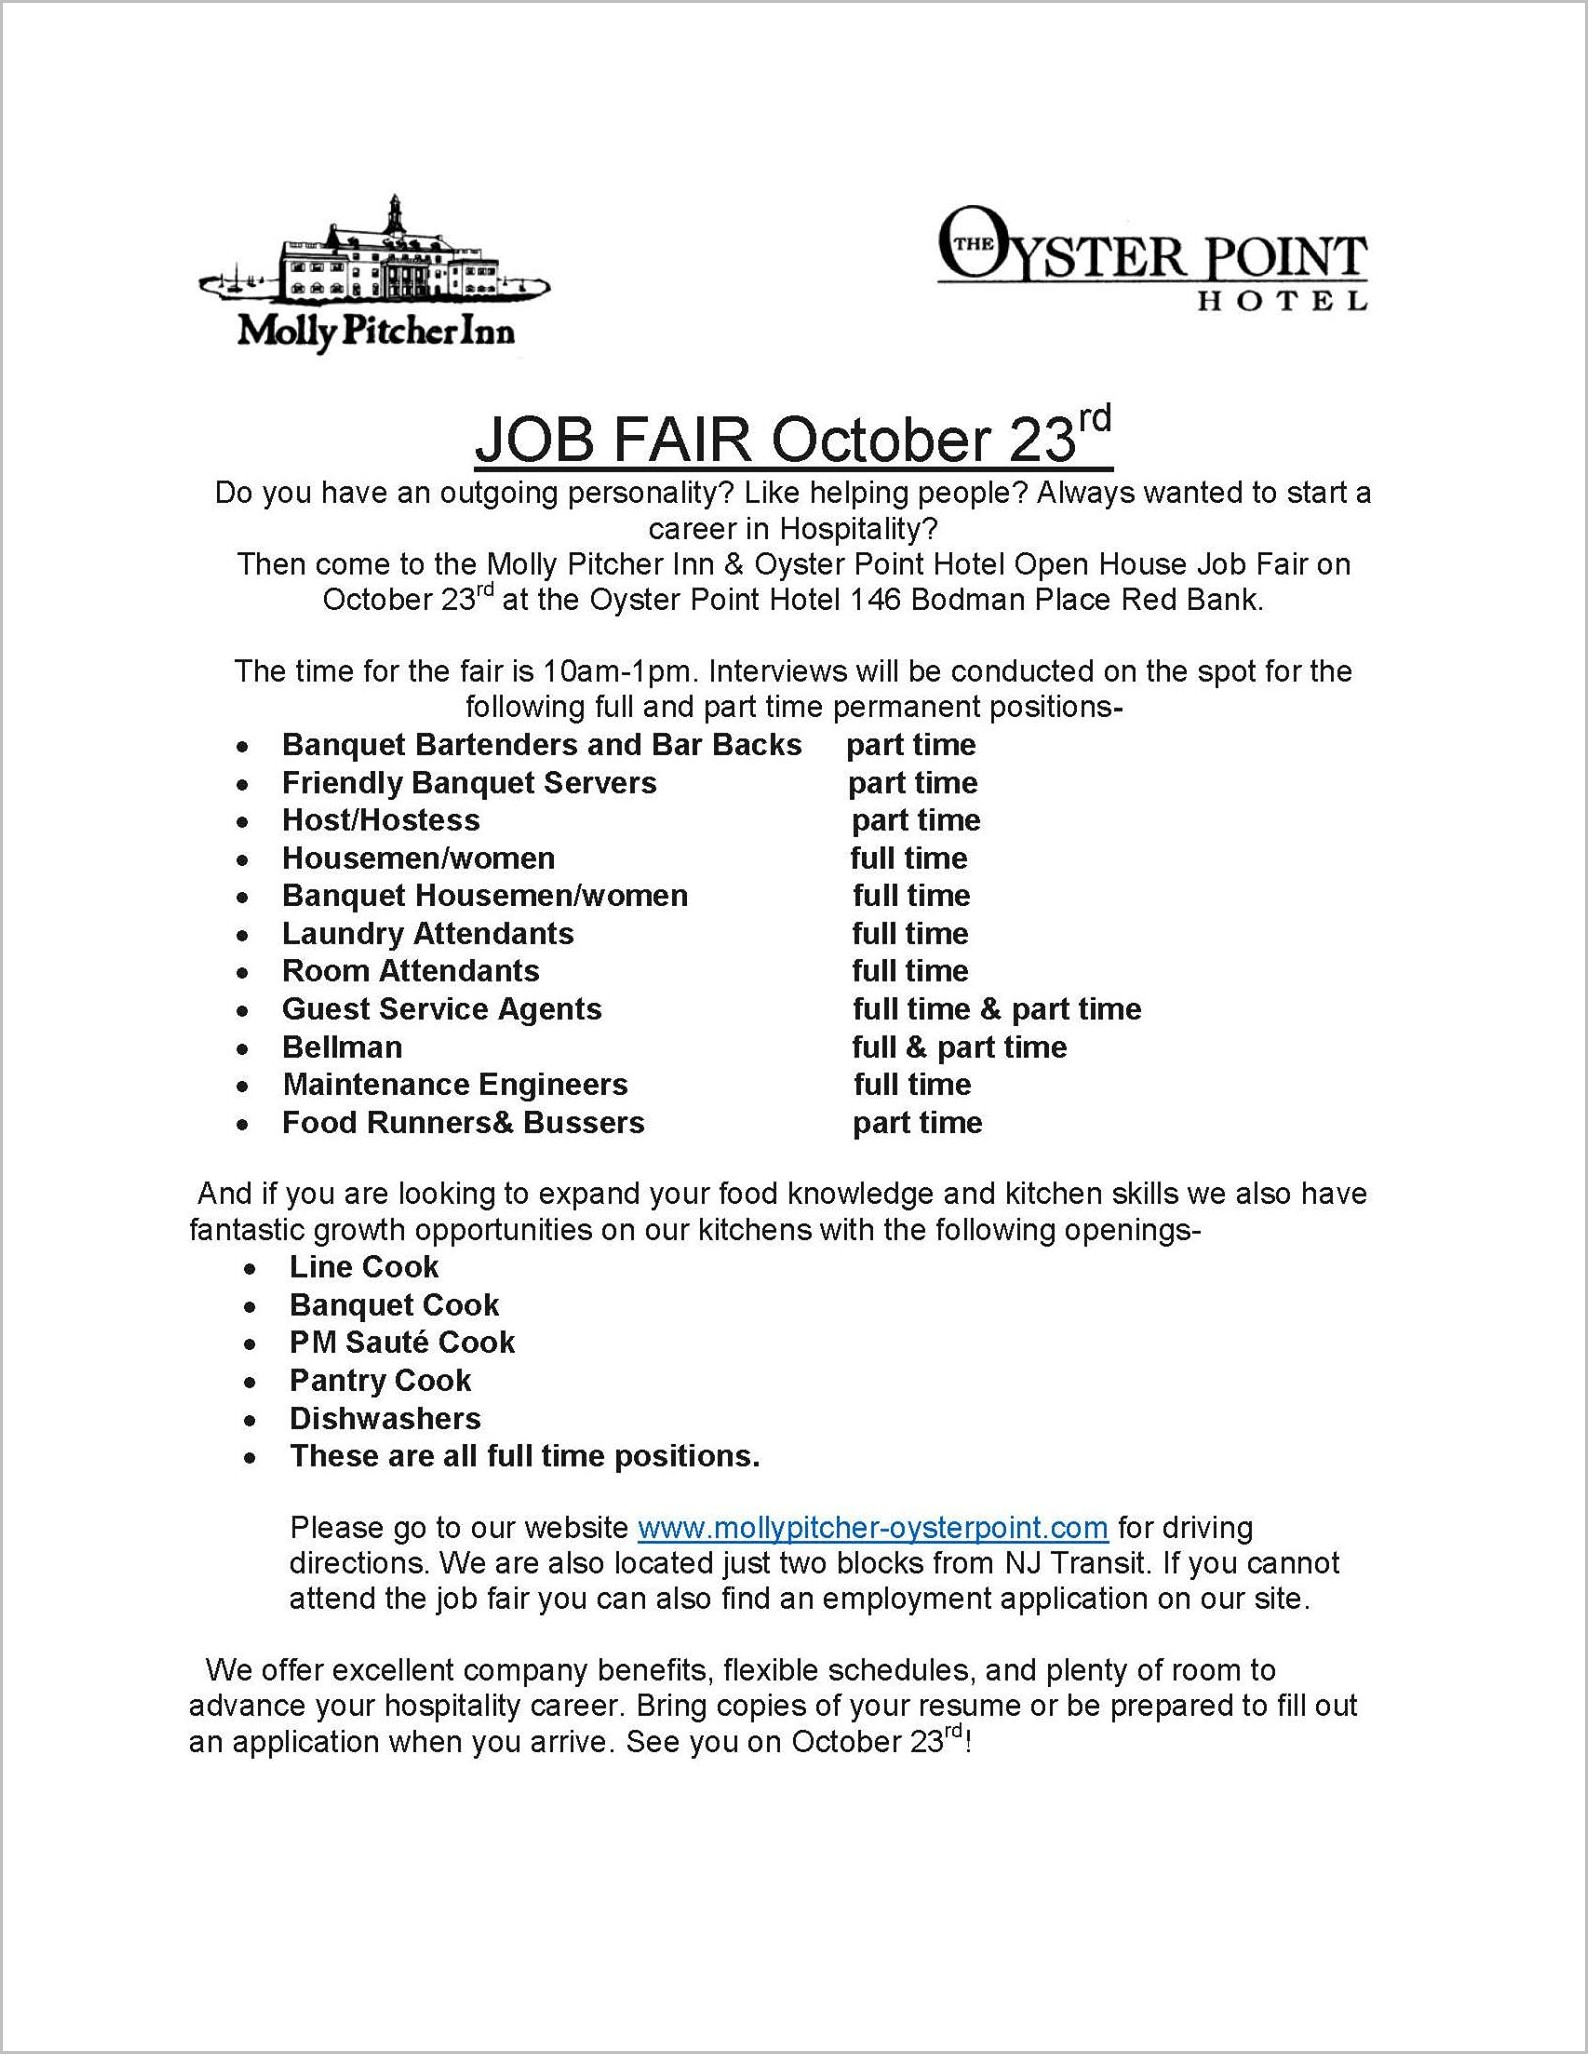 Nj Transit Job Fair